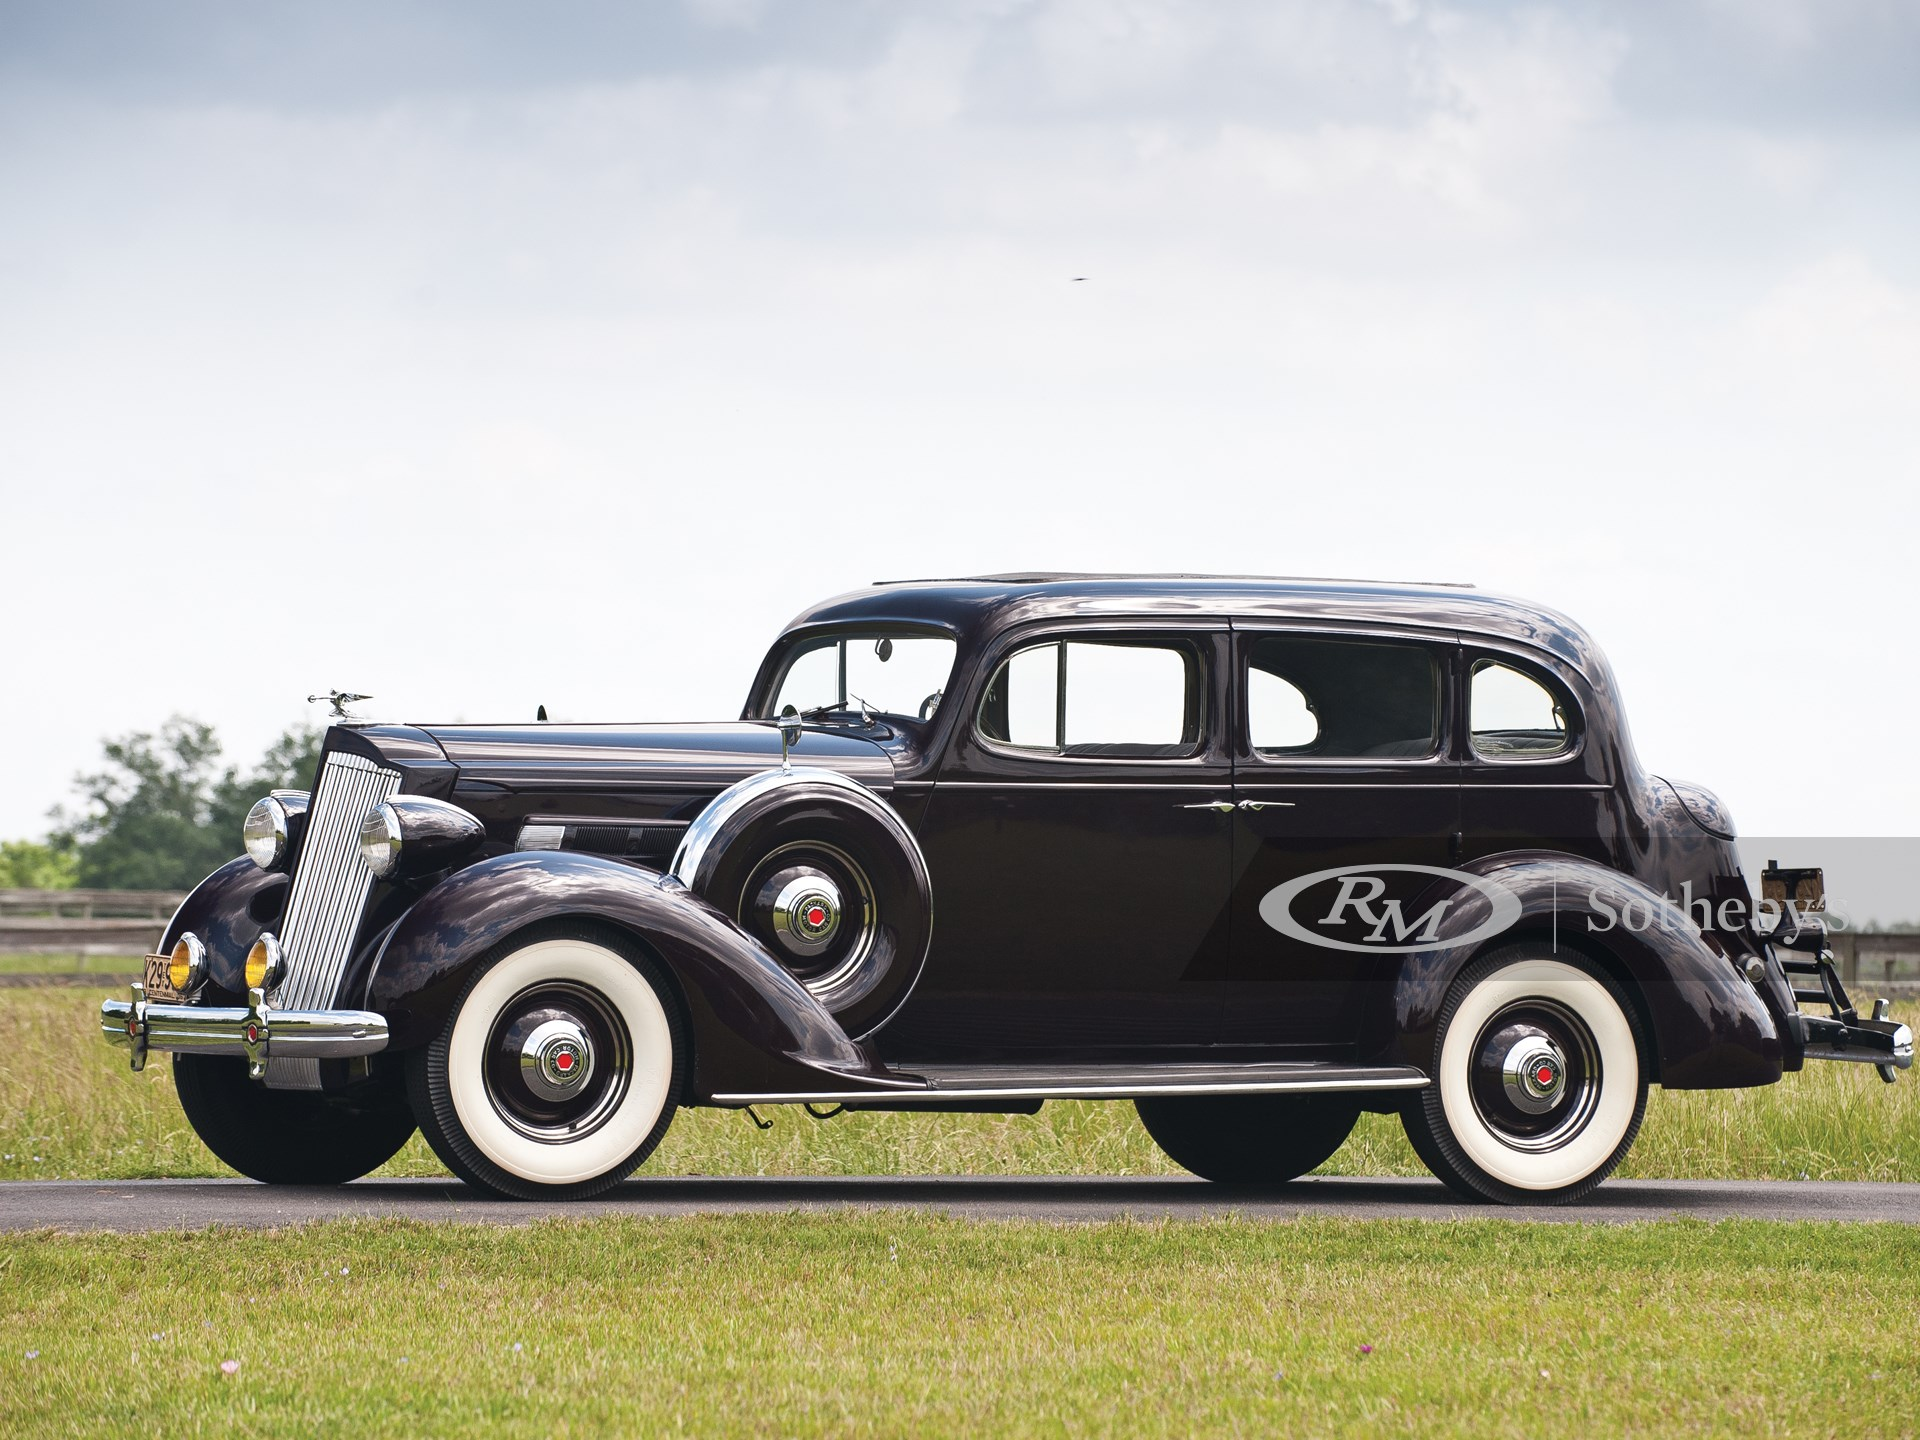 1936 Packard One Twenty Touring Sedan